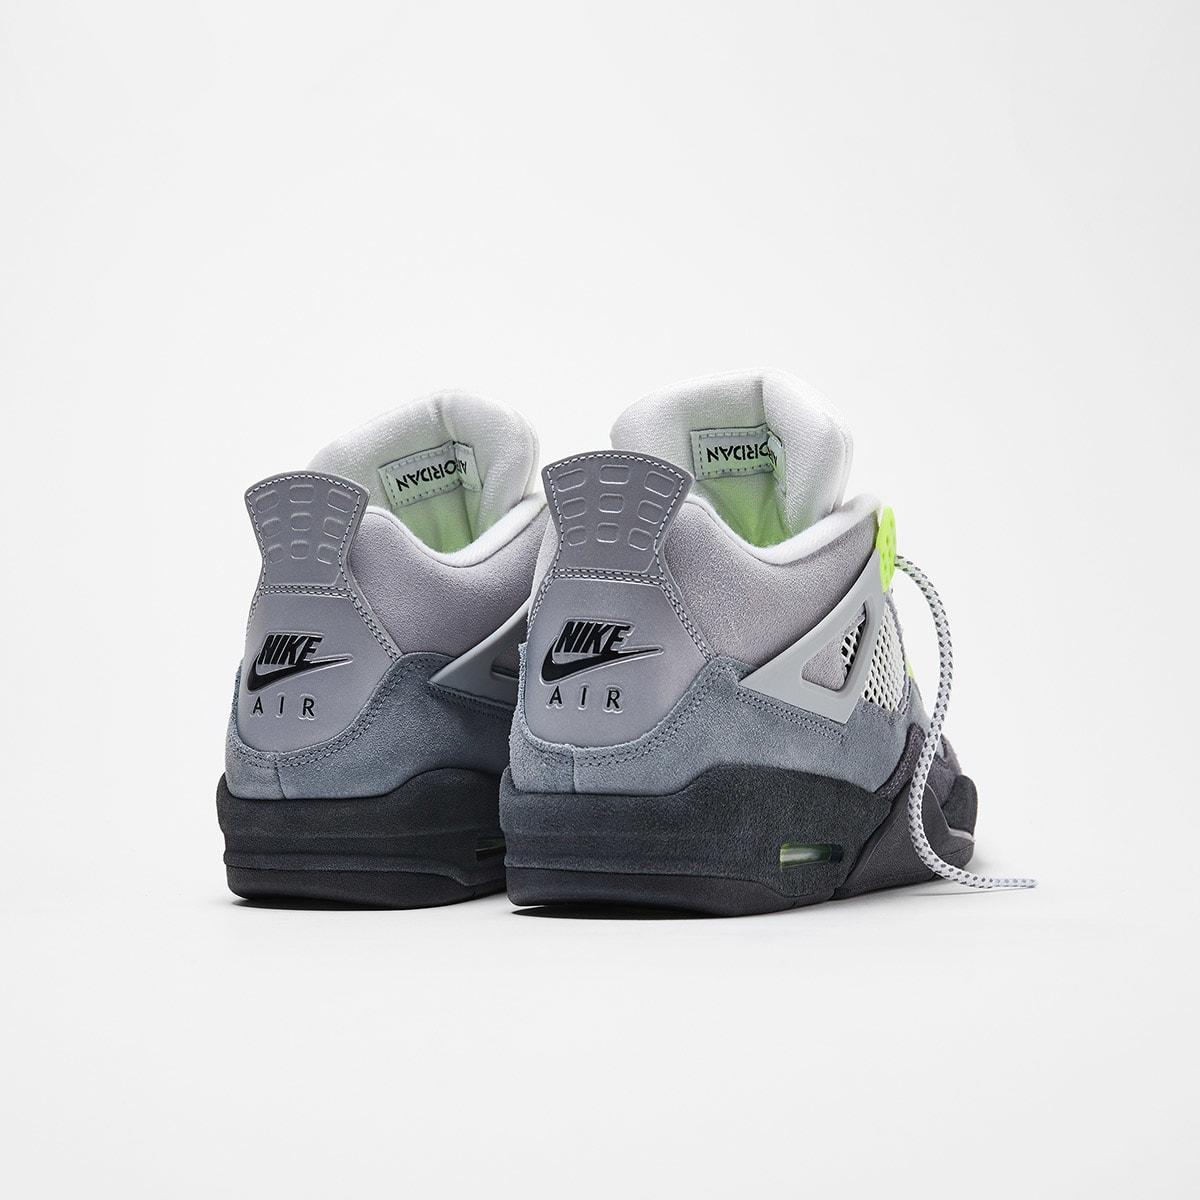 Air Jordan 4 Retro SE - CT5342-007